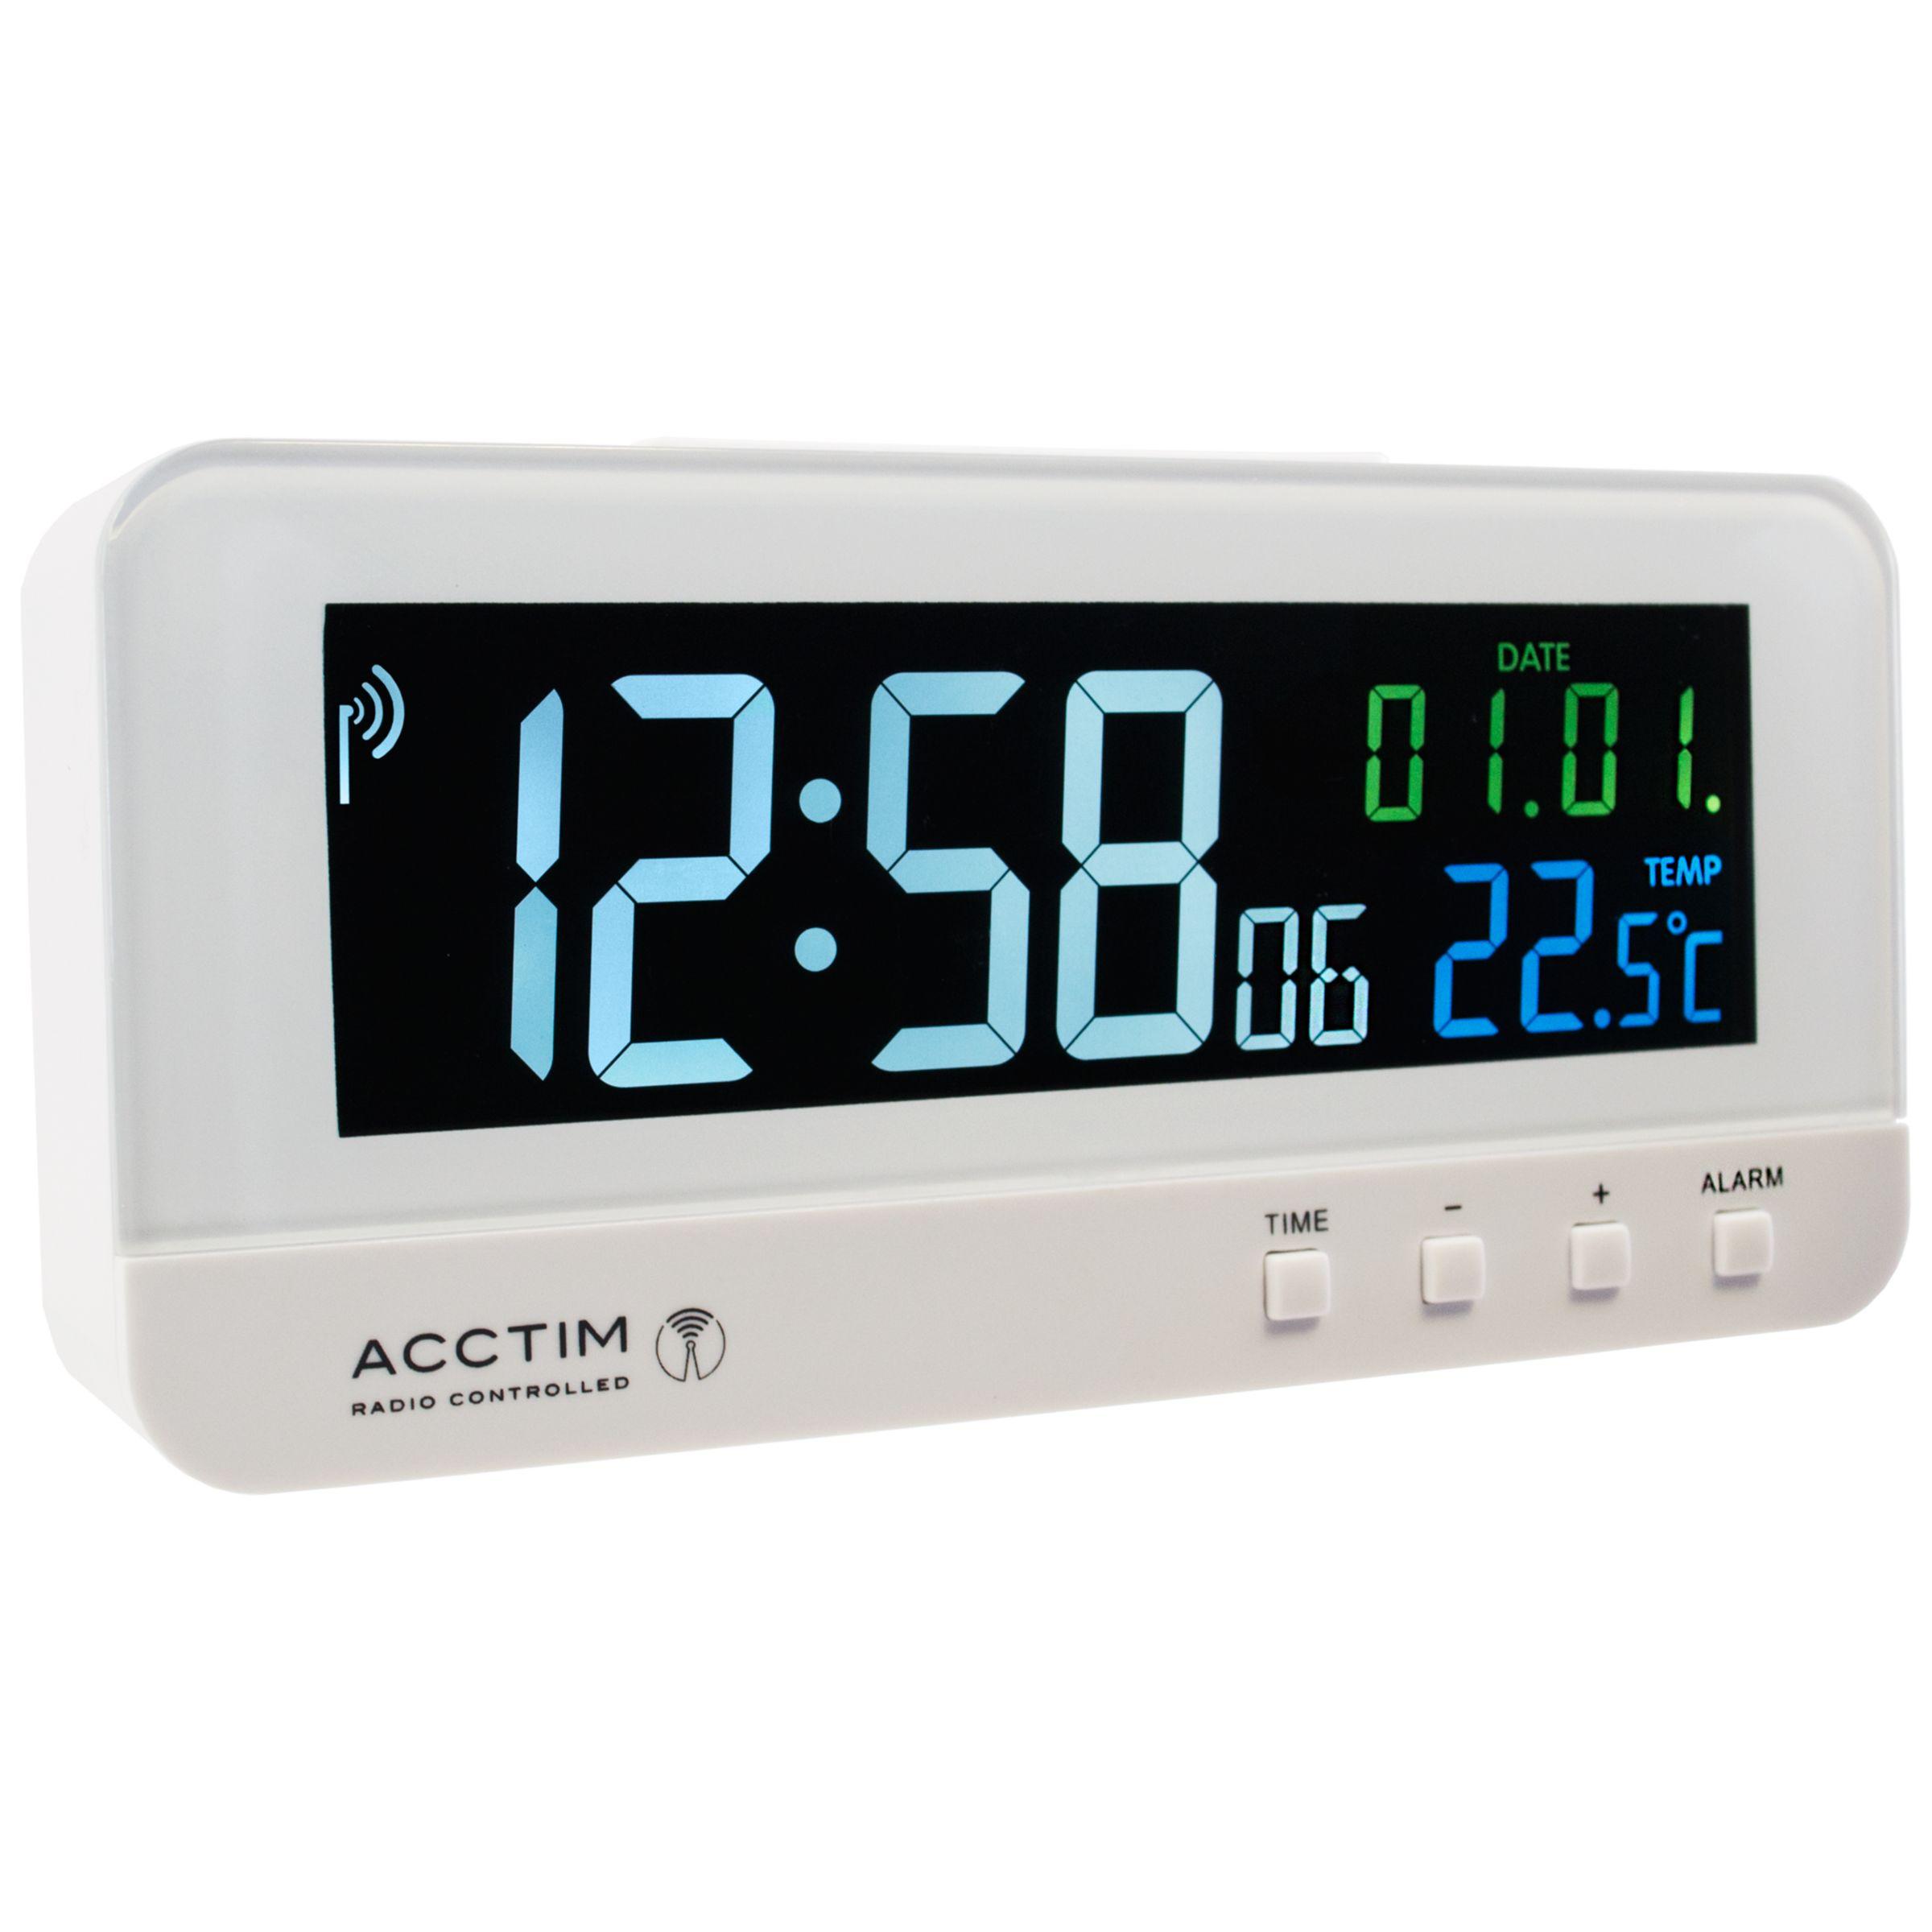 Acctim Acctim Radio Controlled LCD Alarm Clock, White